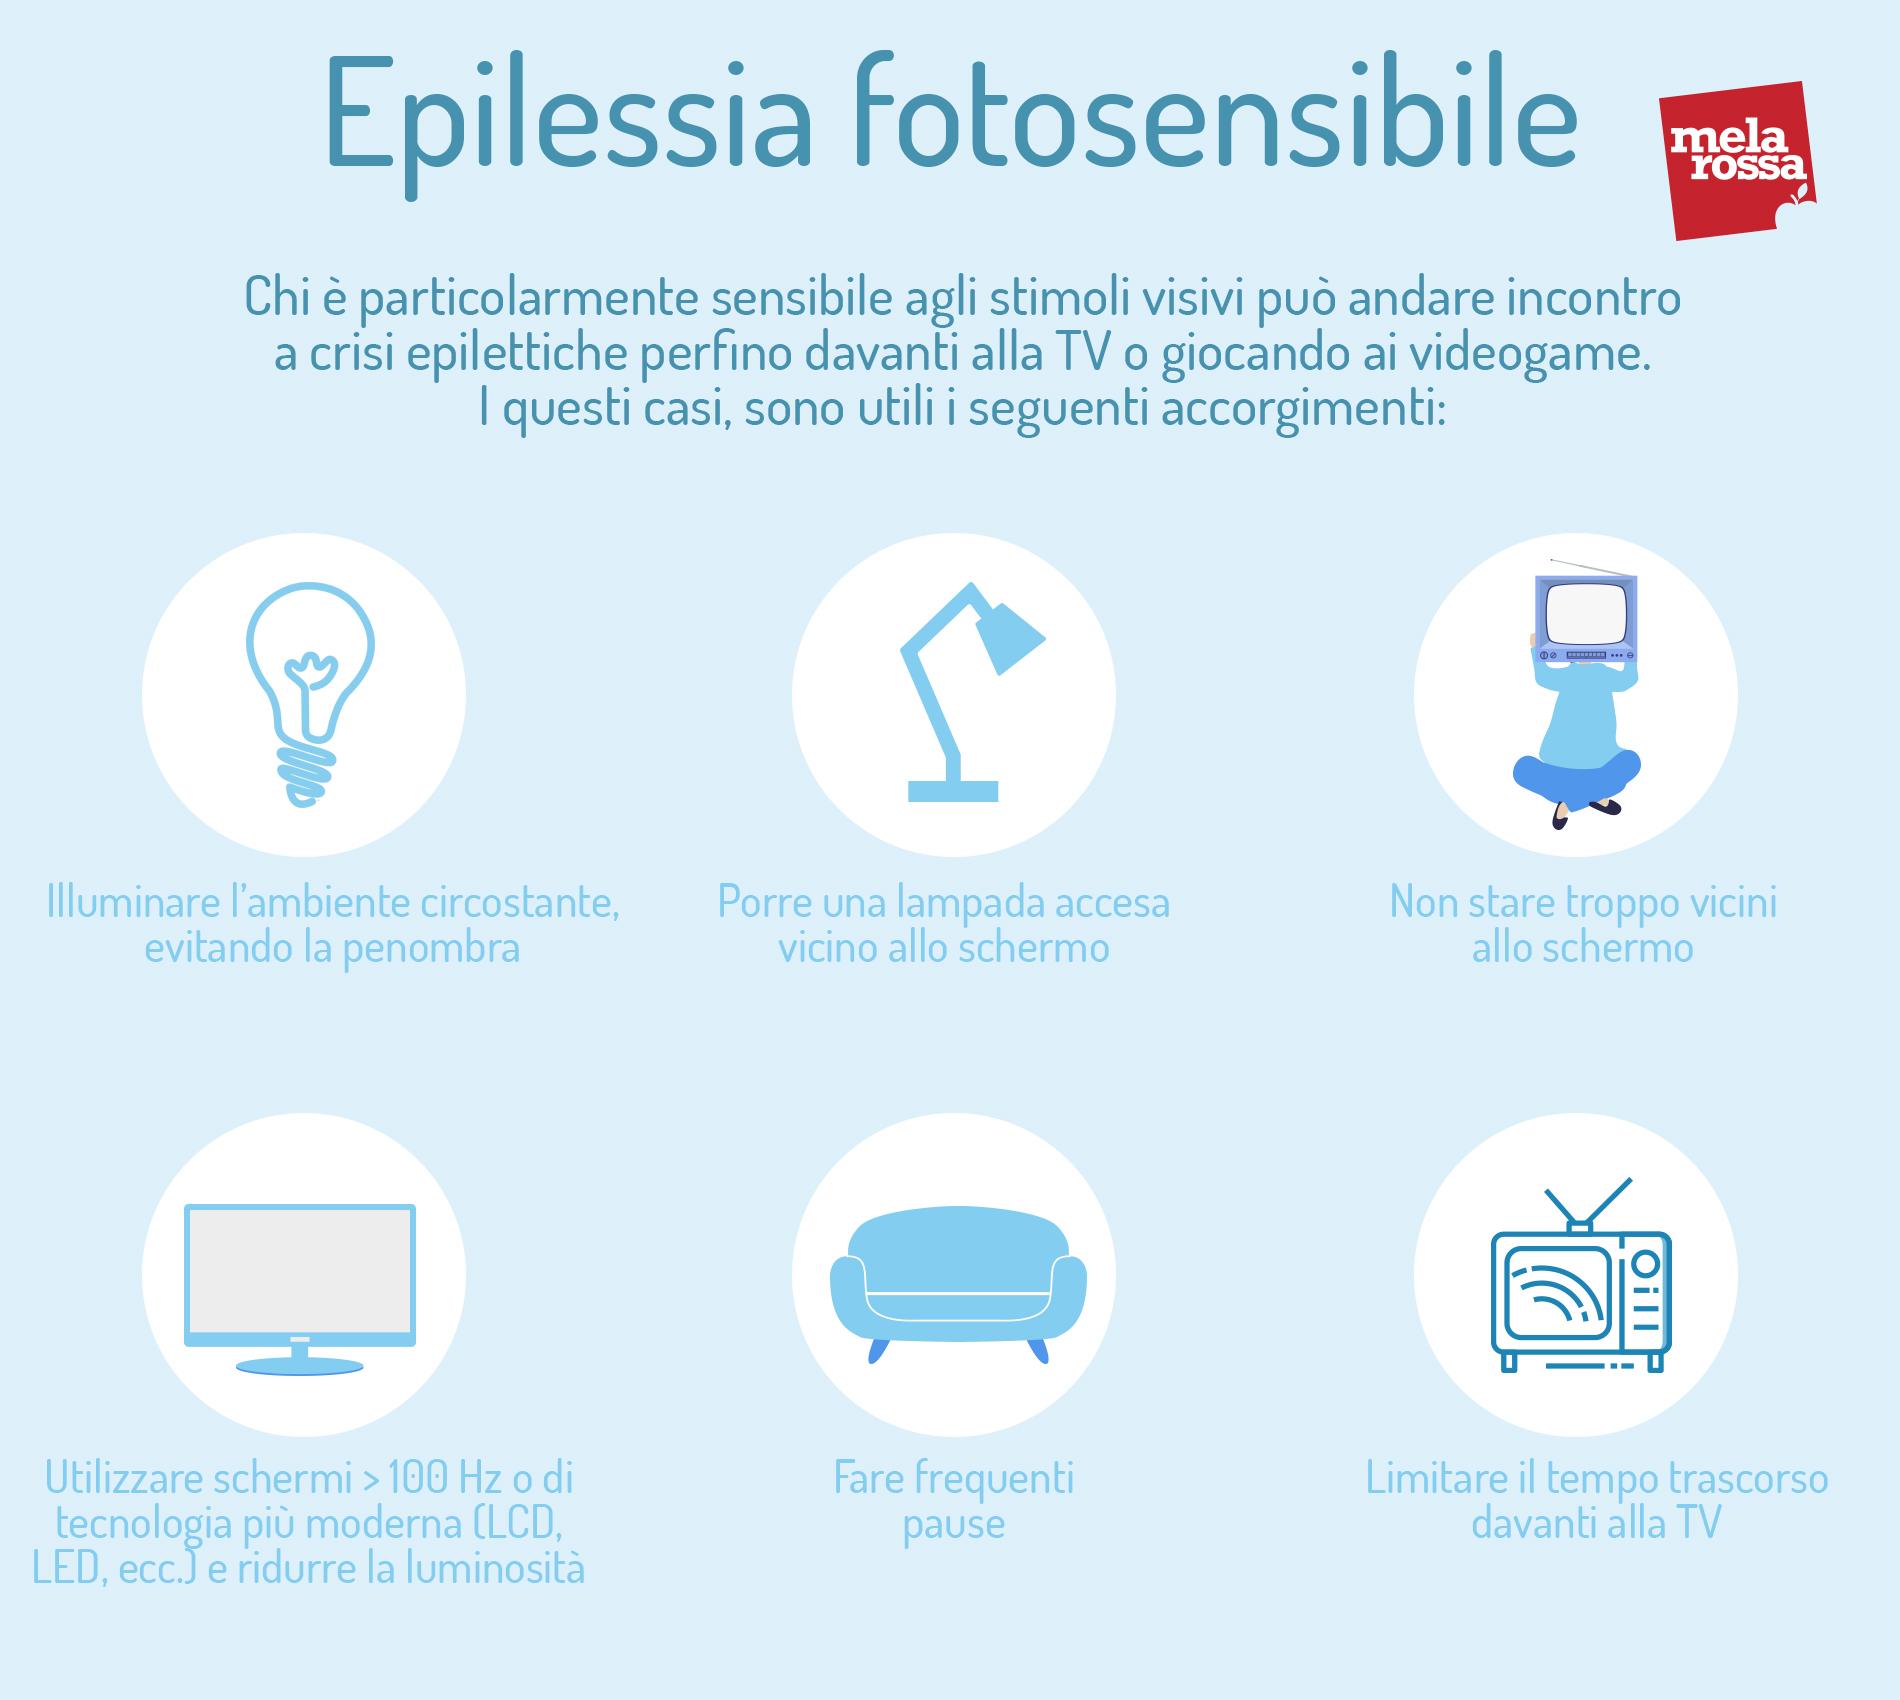 epilessia fotosensibile